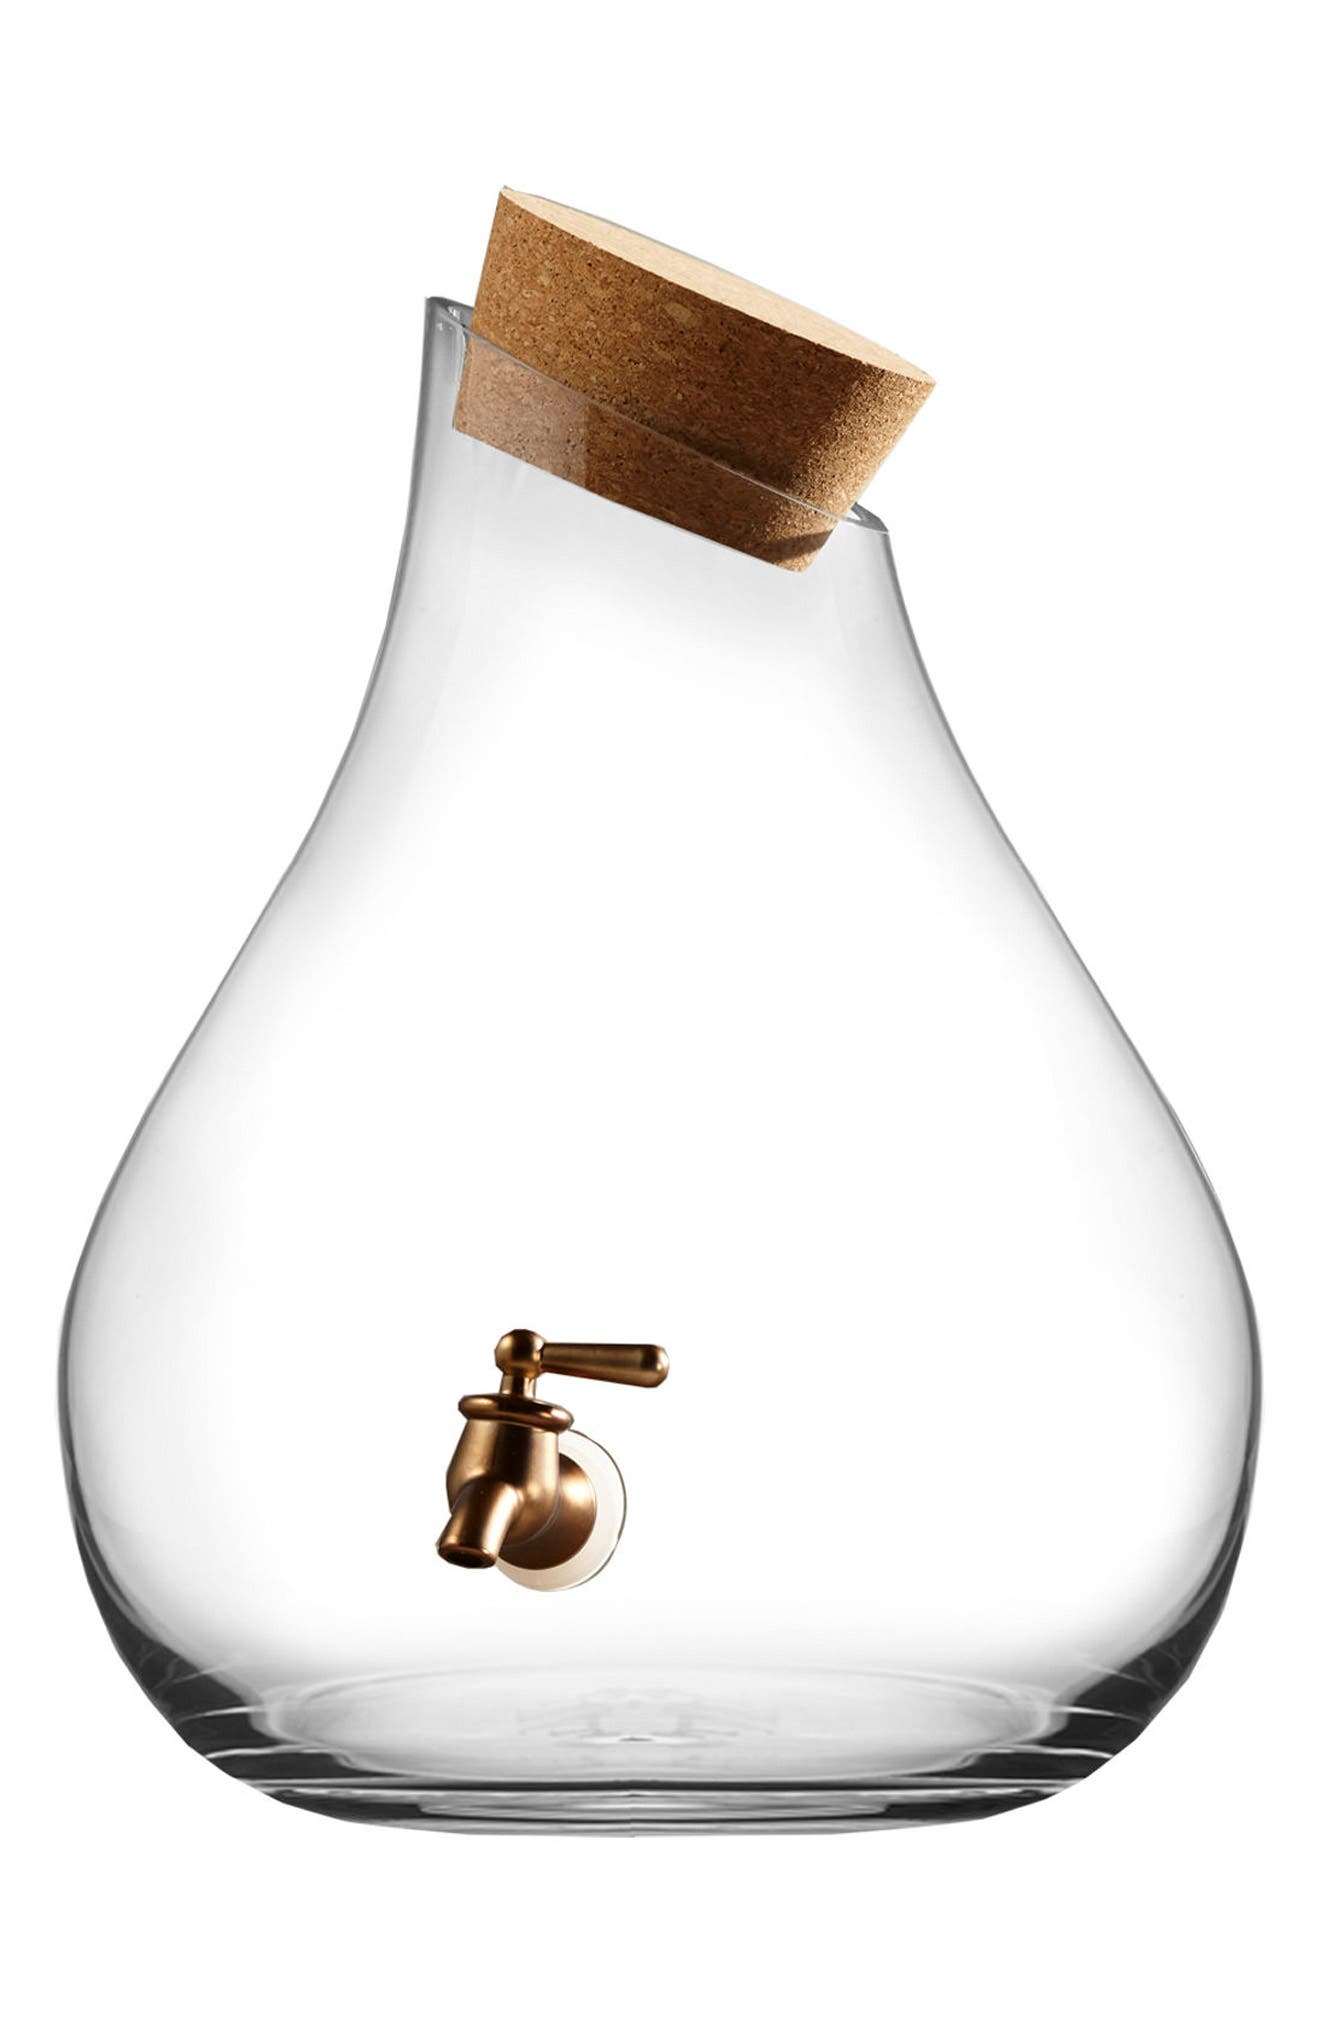 2.5-Gallon Beverage Dispenser,                             Main thumbnail 1, color,                             100